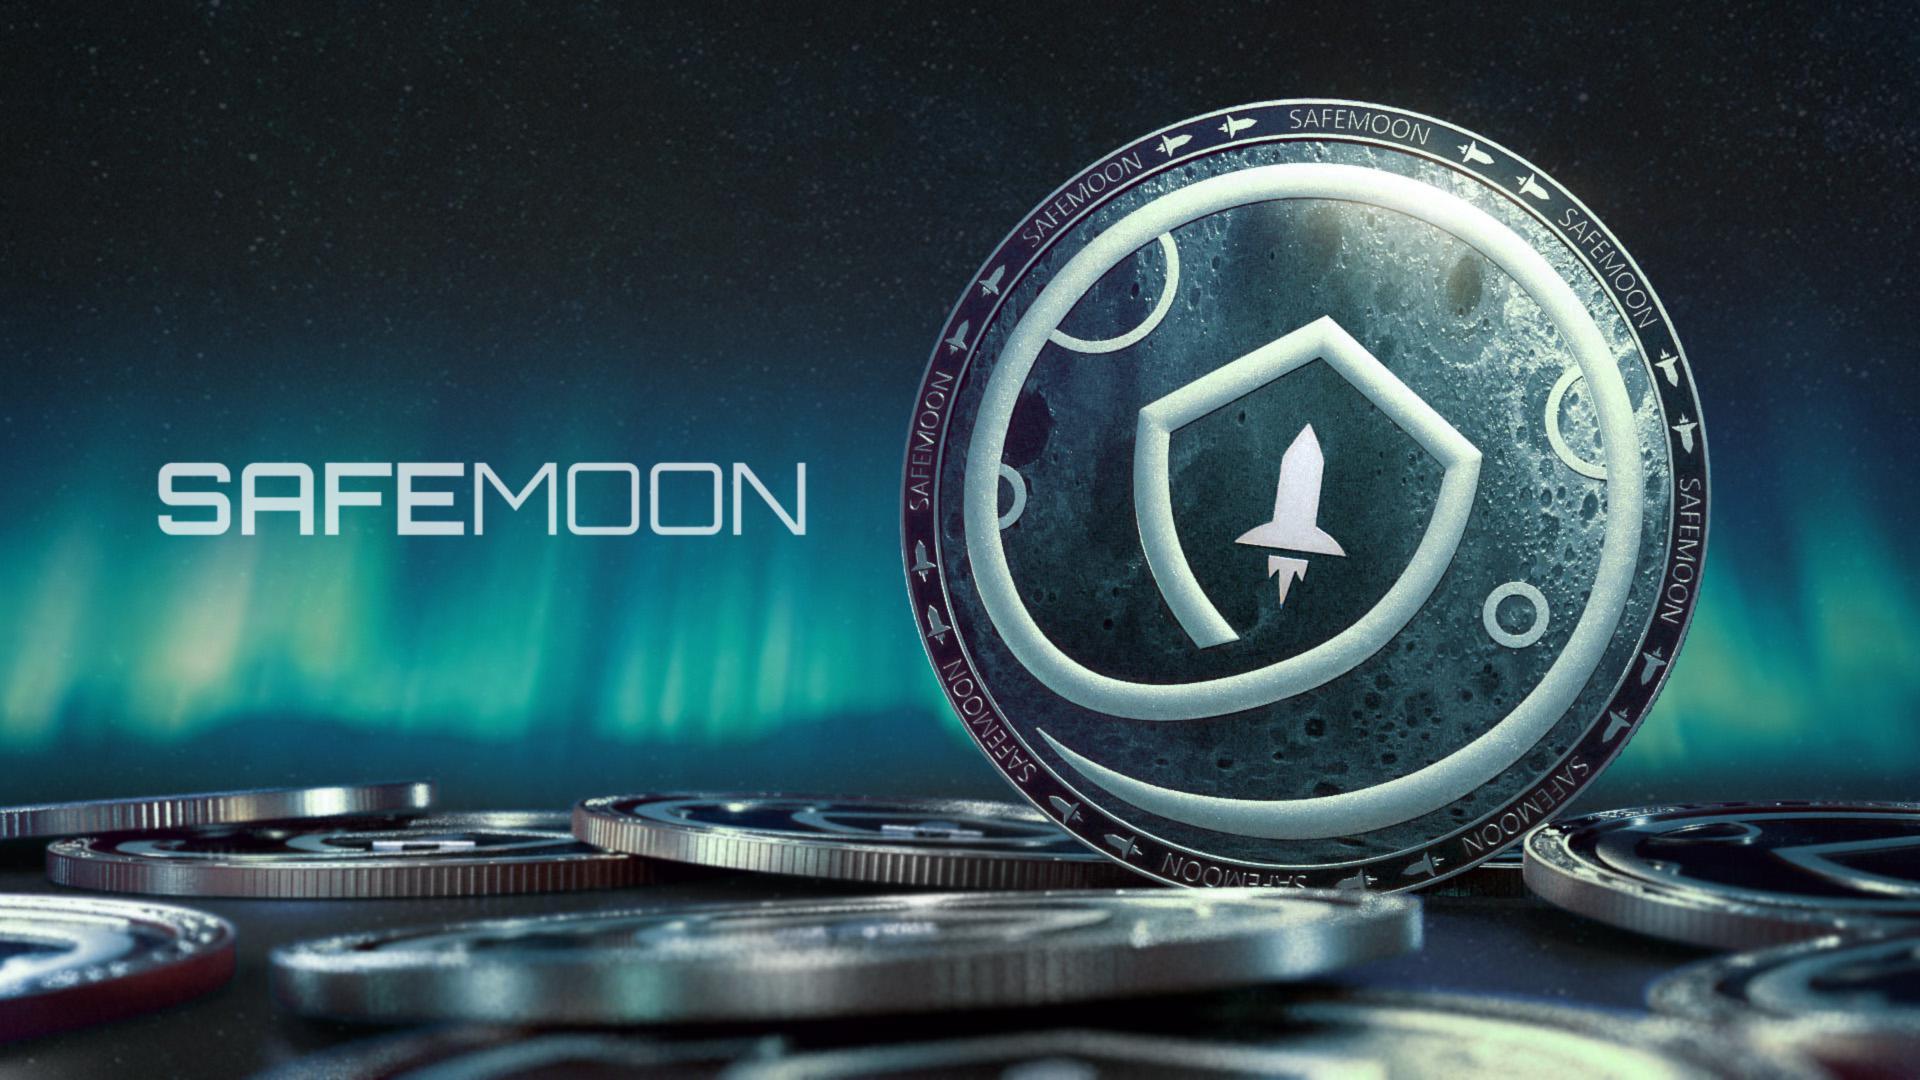 safemoon سیف مون ارز دیجیتال